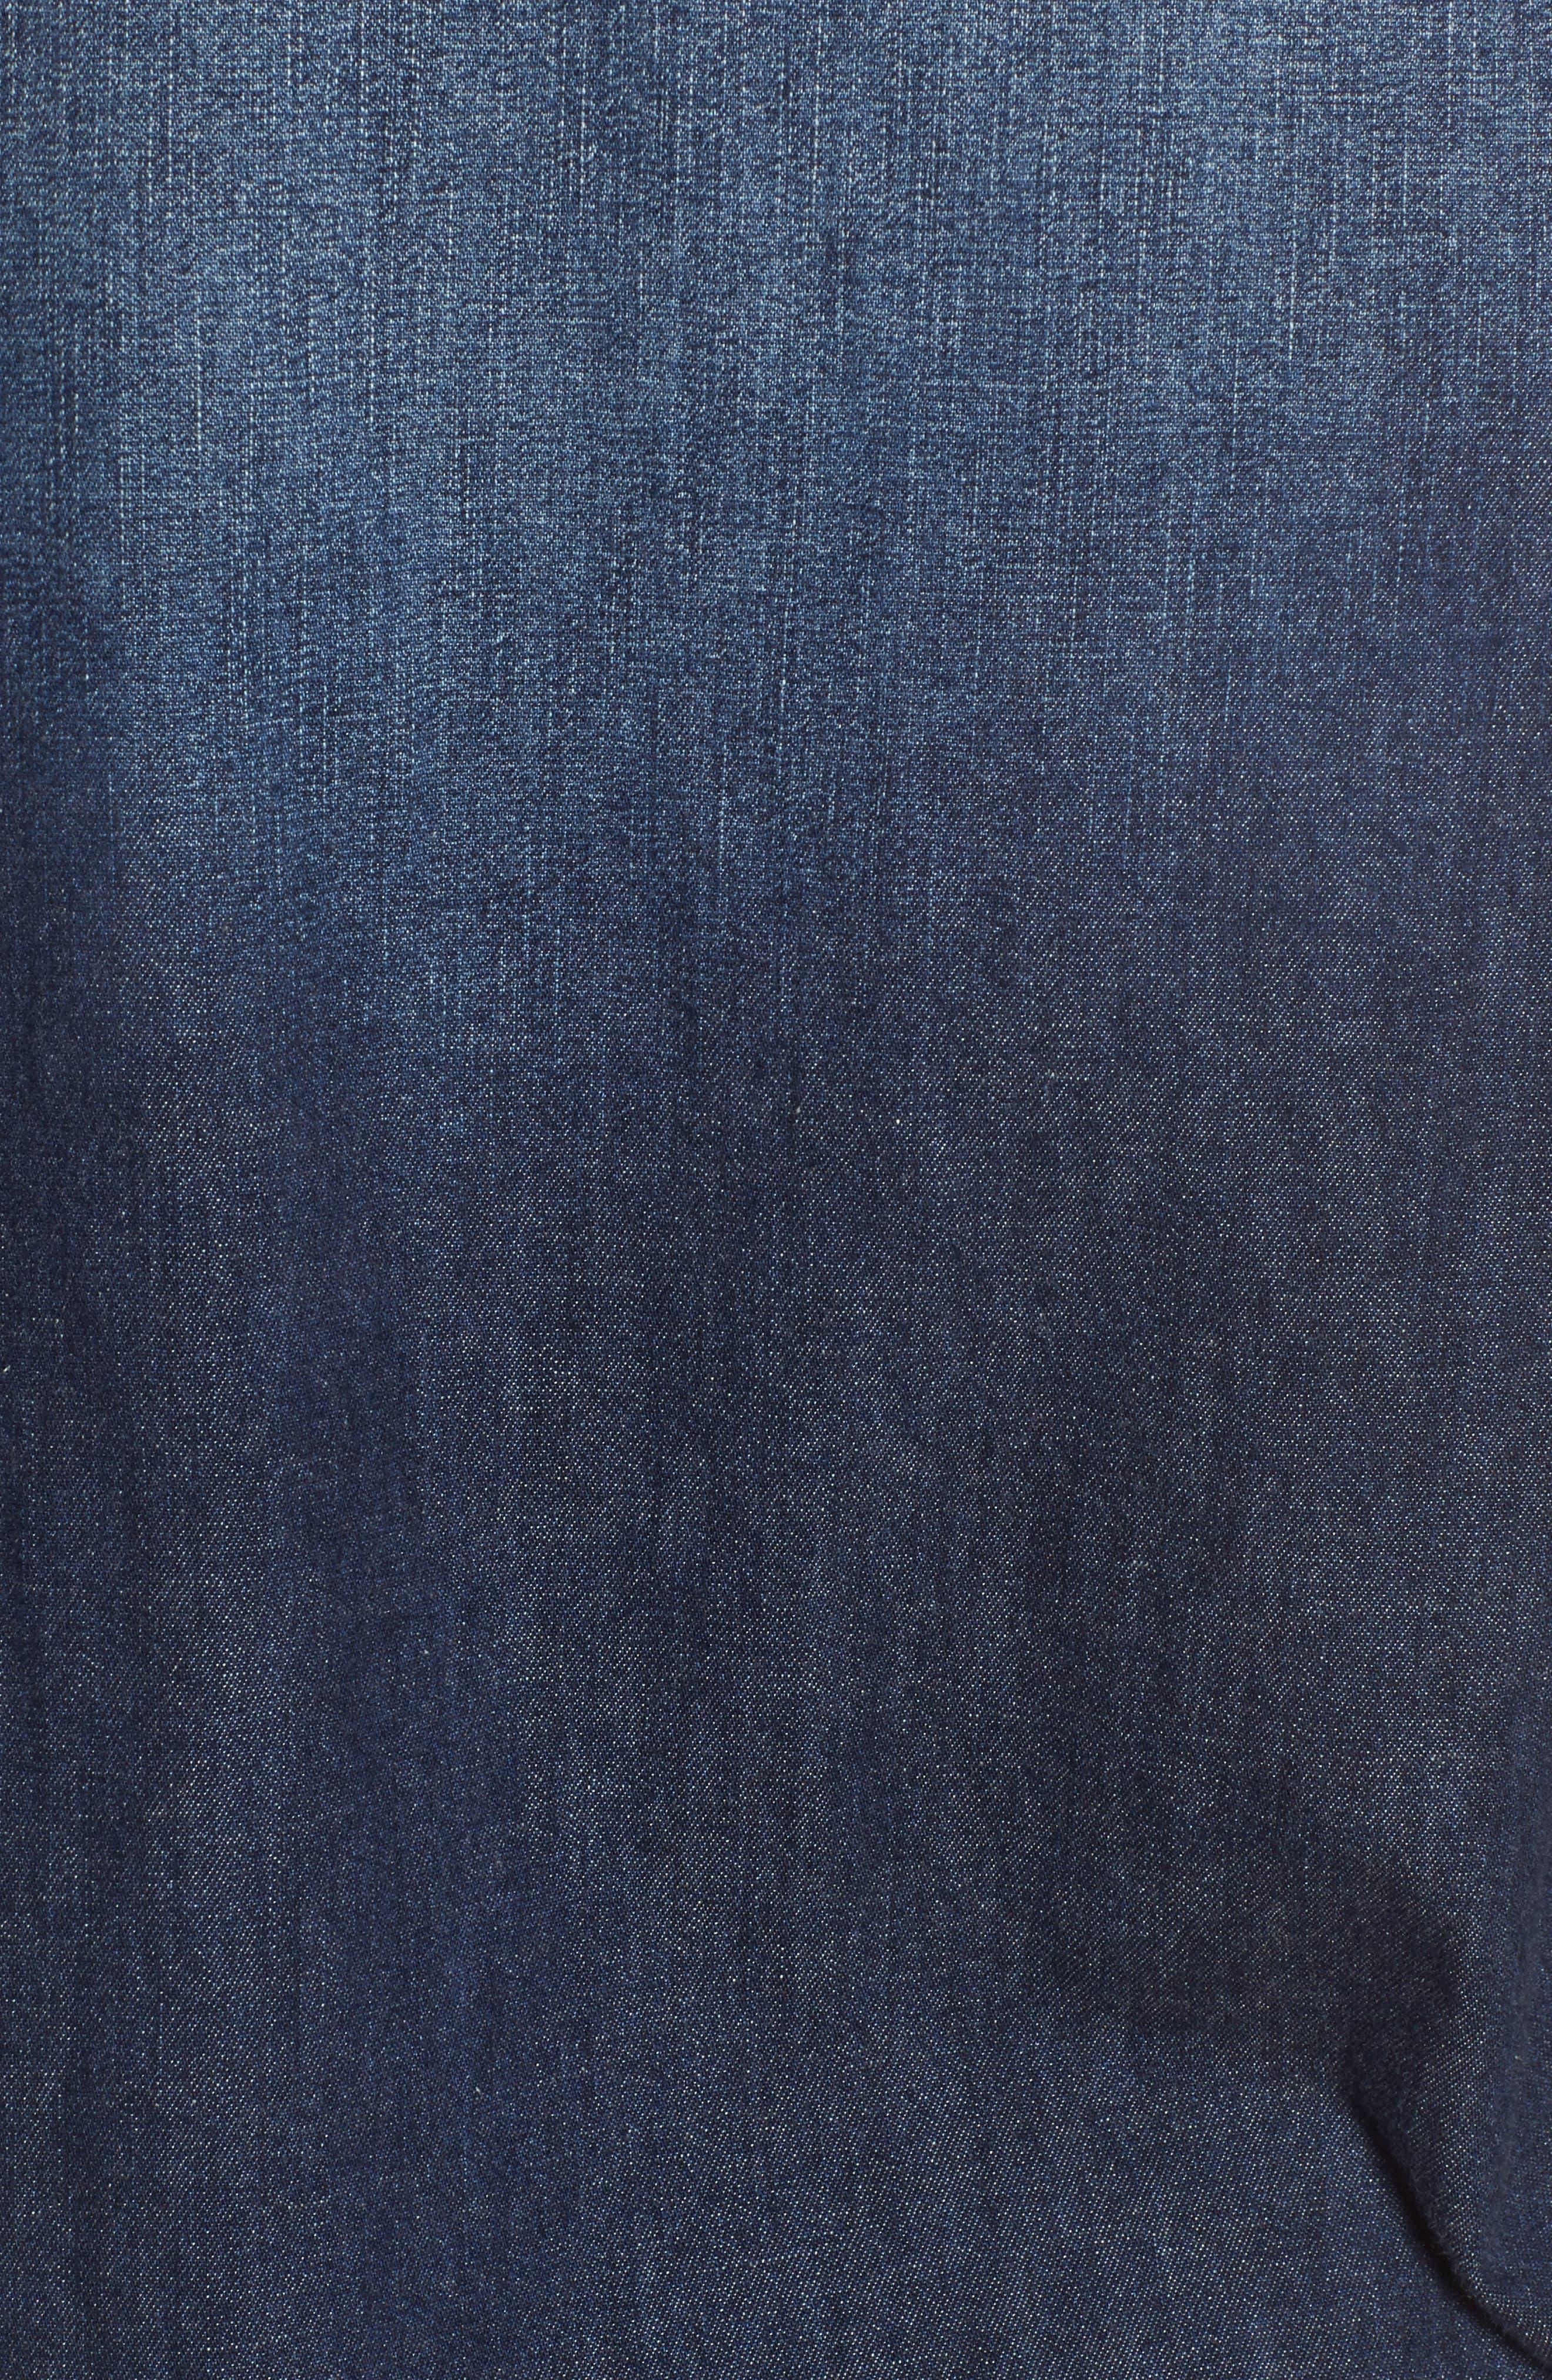 Deanna Denim Shirt,                             Alternate thumbnail 6, color,                             424